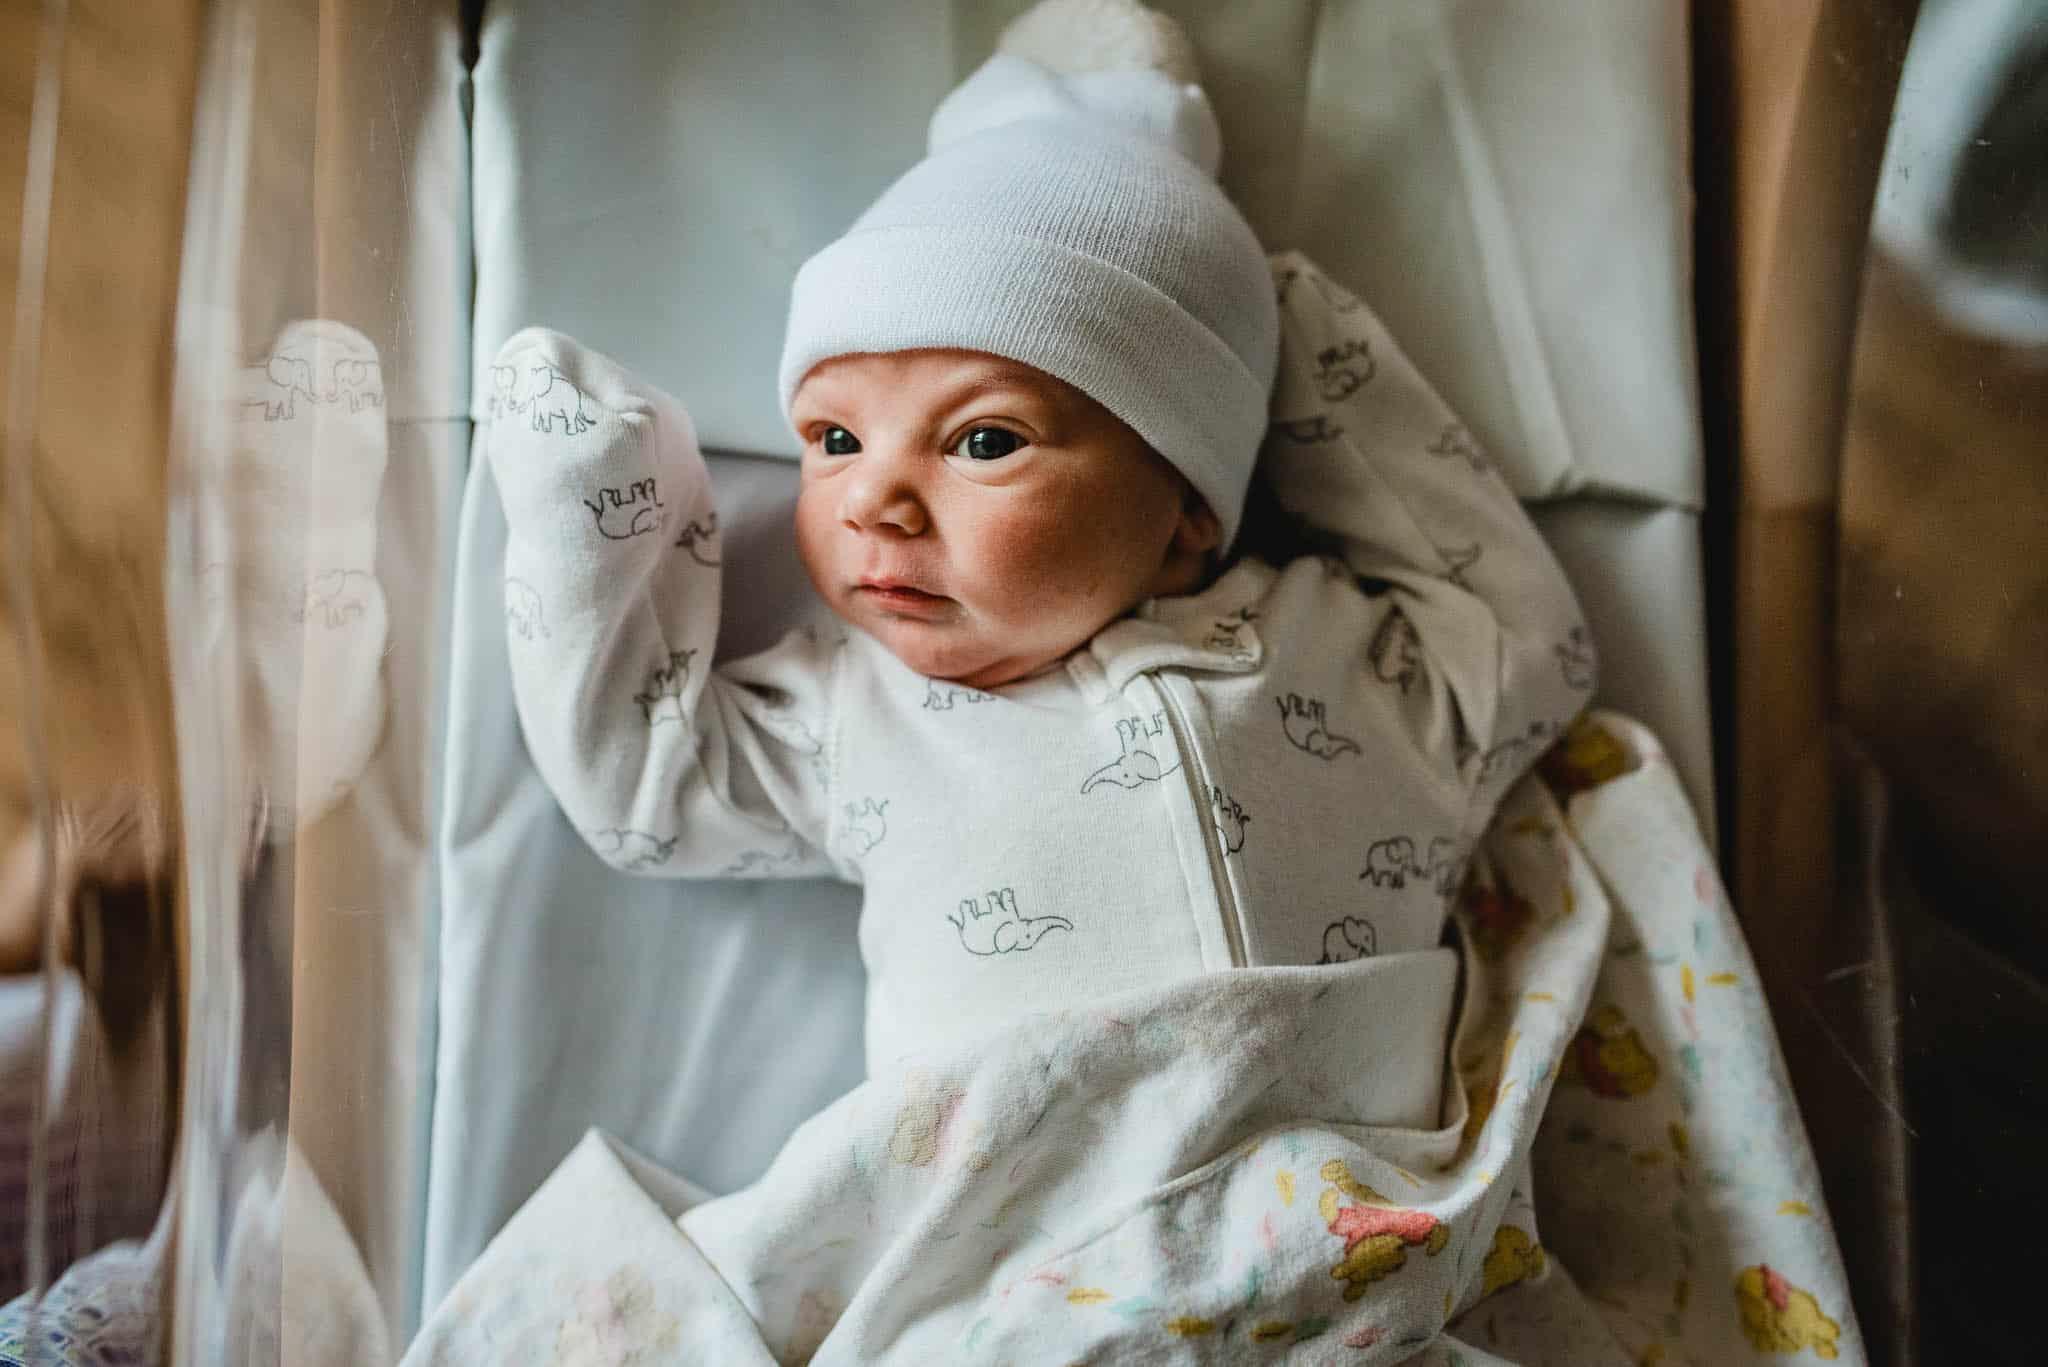 pictures of newborn babies